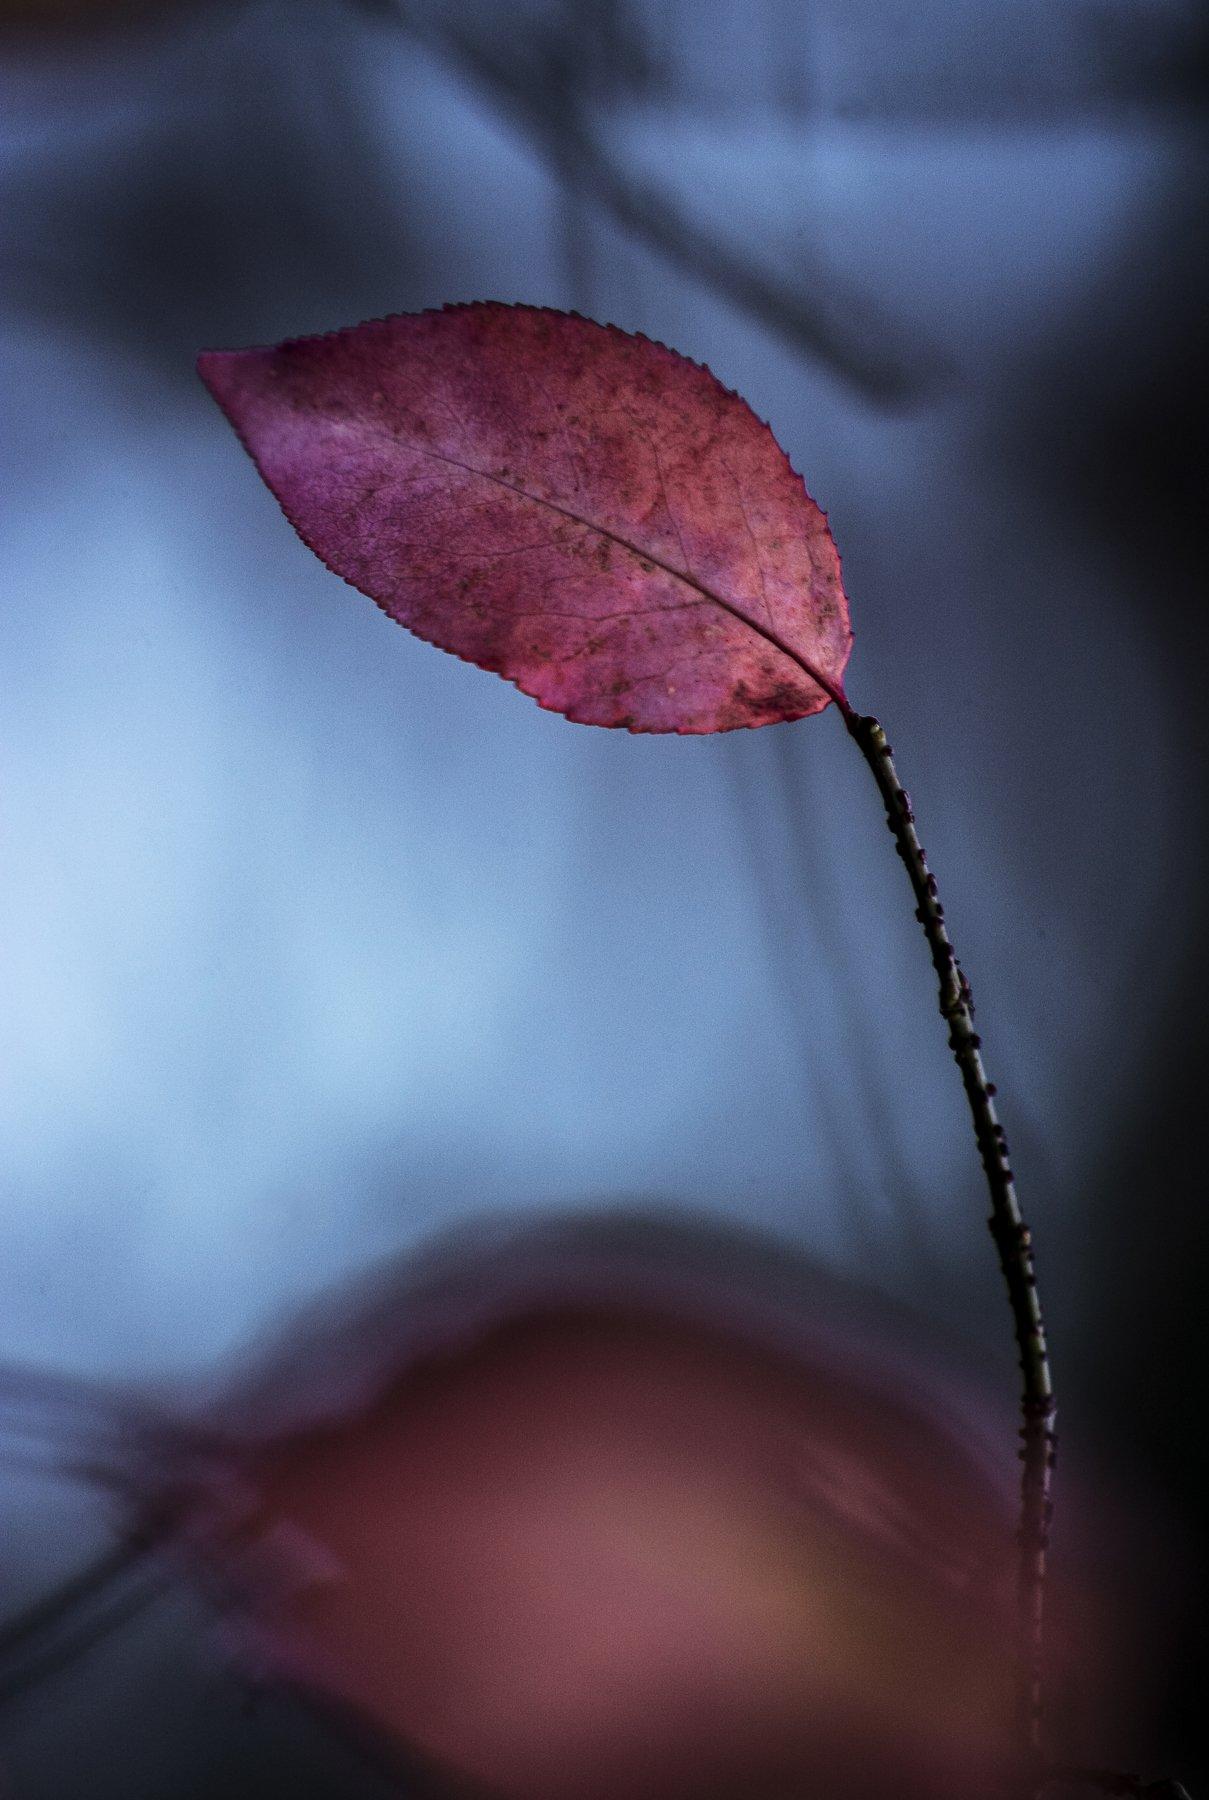 fall, autumn, autumnleaves, autumnweather, autumncolors, autumn2018, autumncolours, leaffall, autumnal, autumndays, autumntime, autumnsky, autumnstyle, falltime, season, seasons, instafall, instagramanet, instatag, instaautumn, leaf,, Денис Воронин